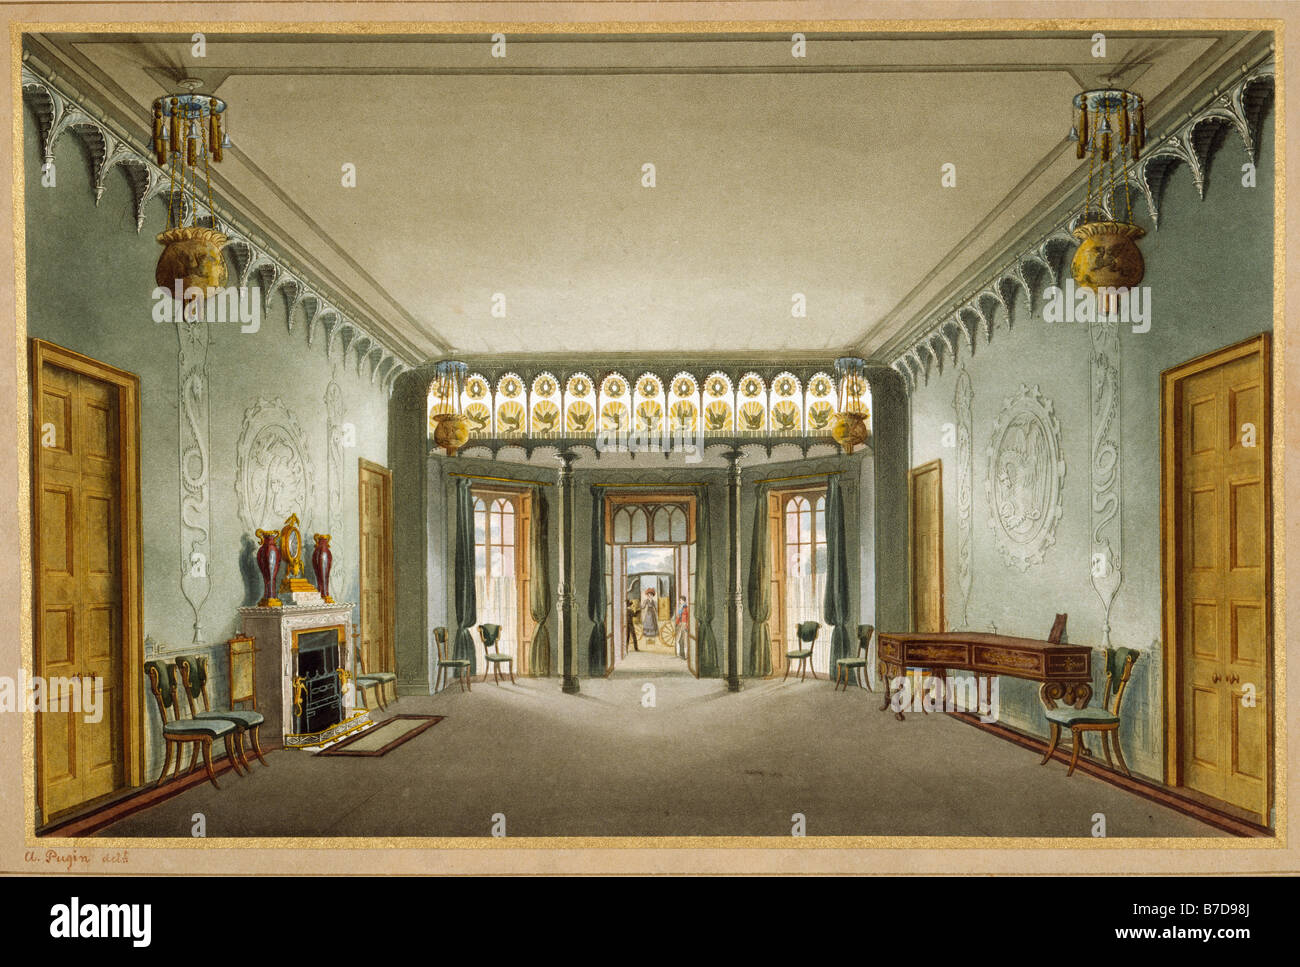 Royal Pavilion  Brighton Entrance Hall Nash & Pugin - Stock Image